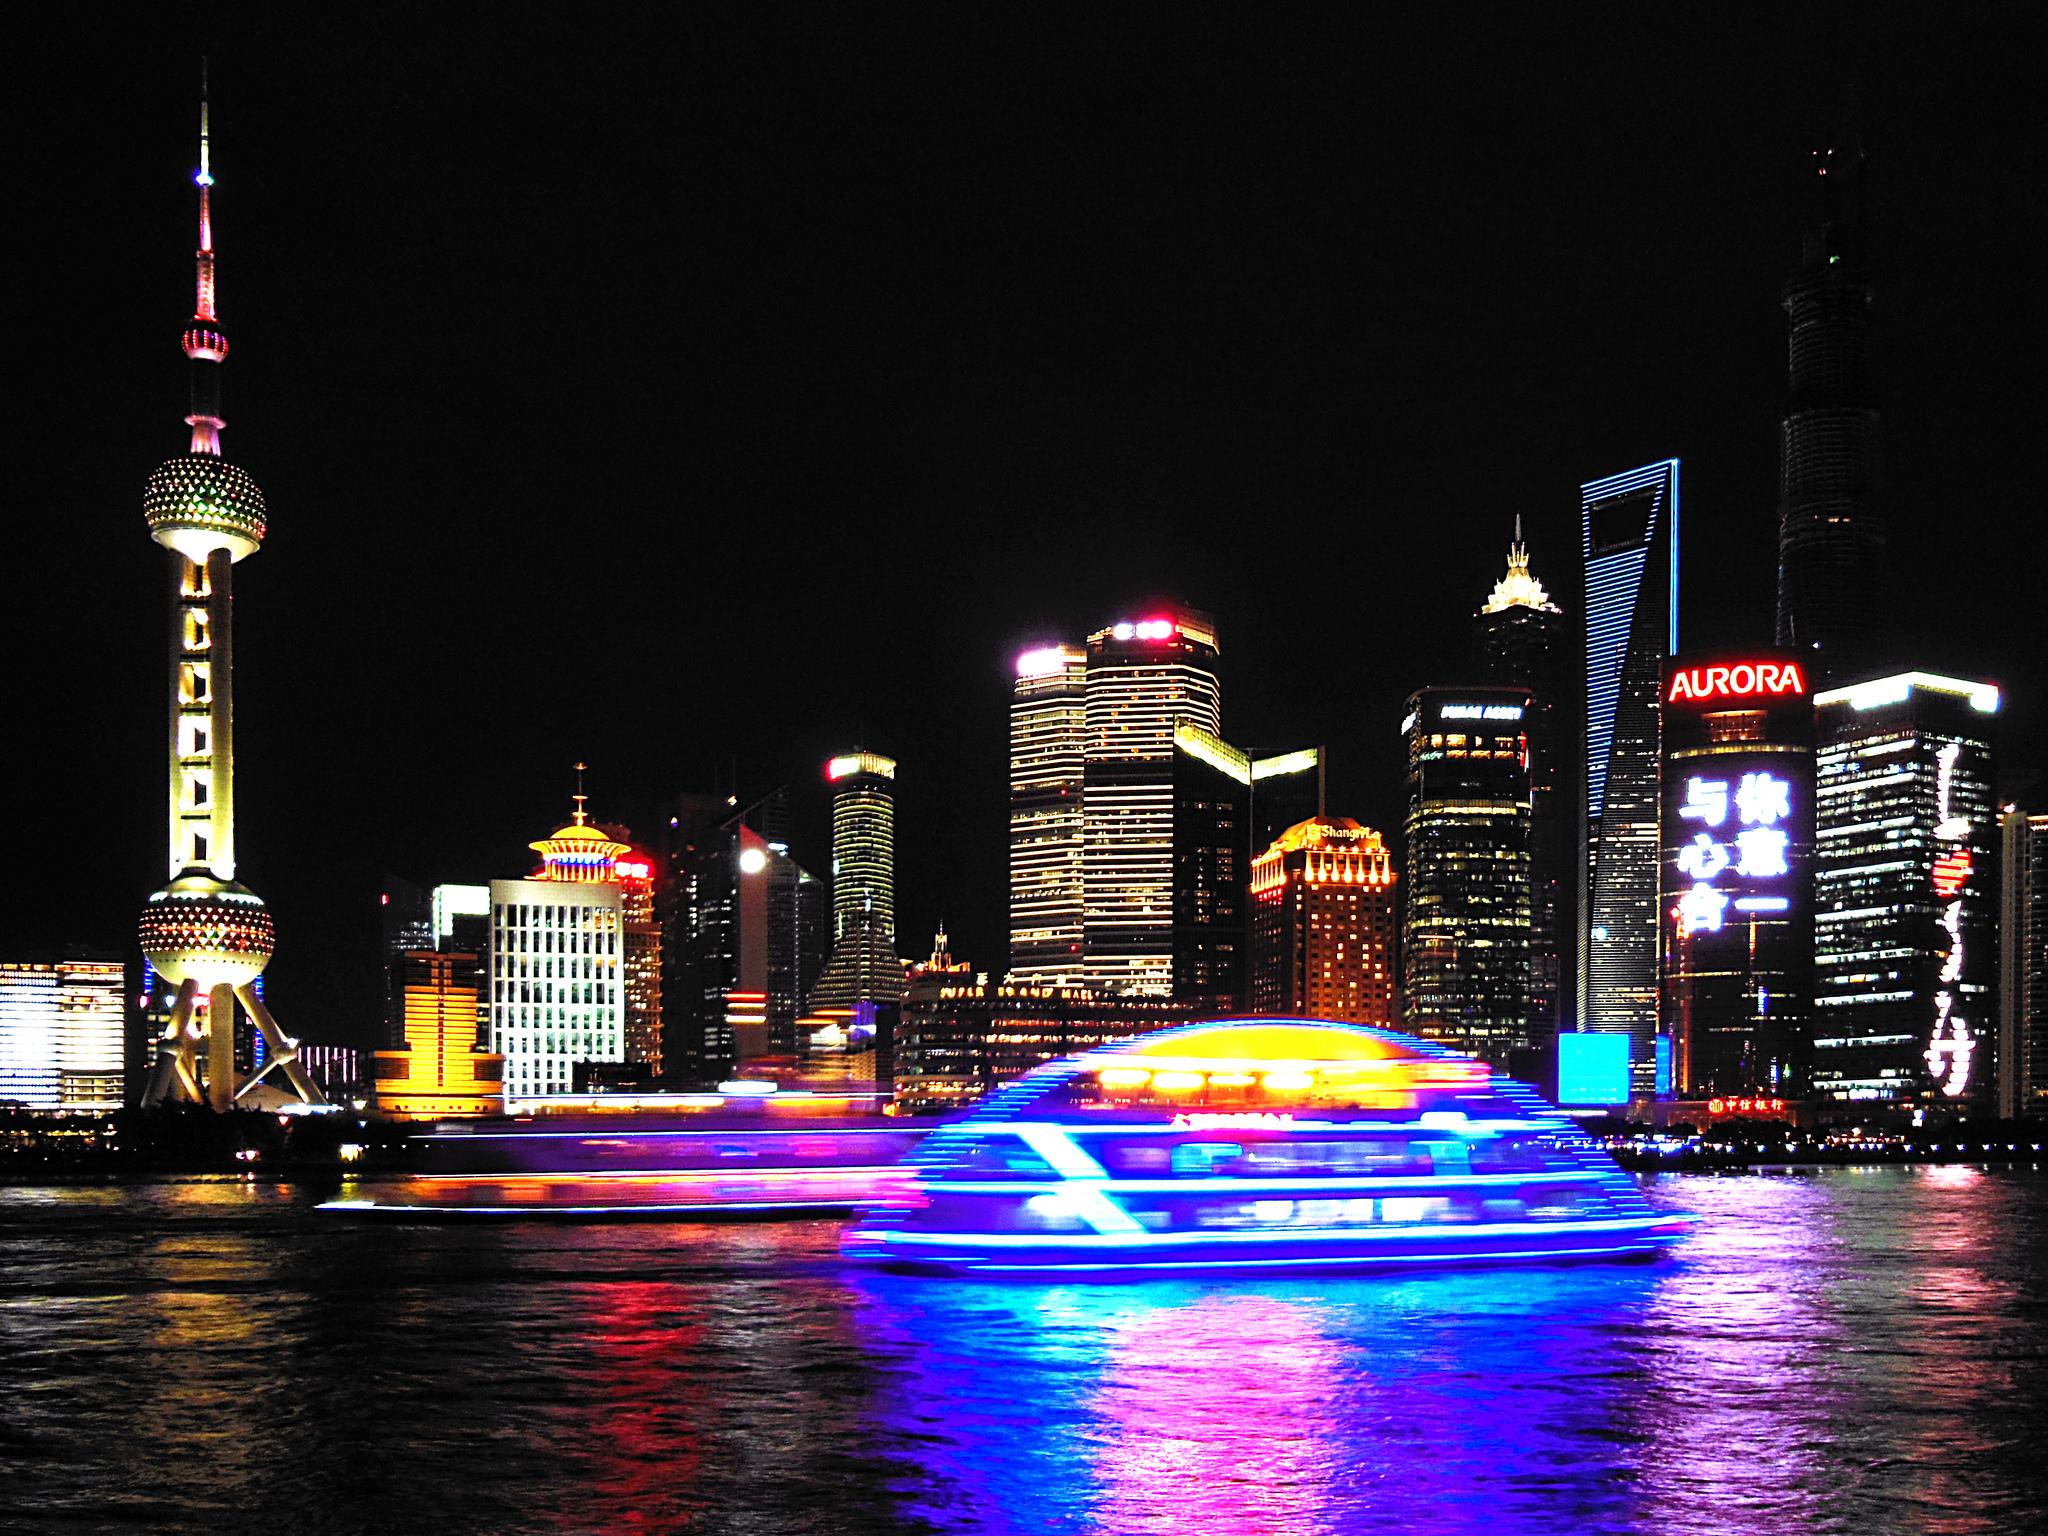 Boat on the Huangpu | ©Dimitry B./Flickr